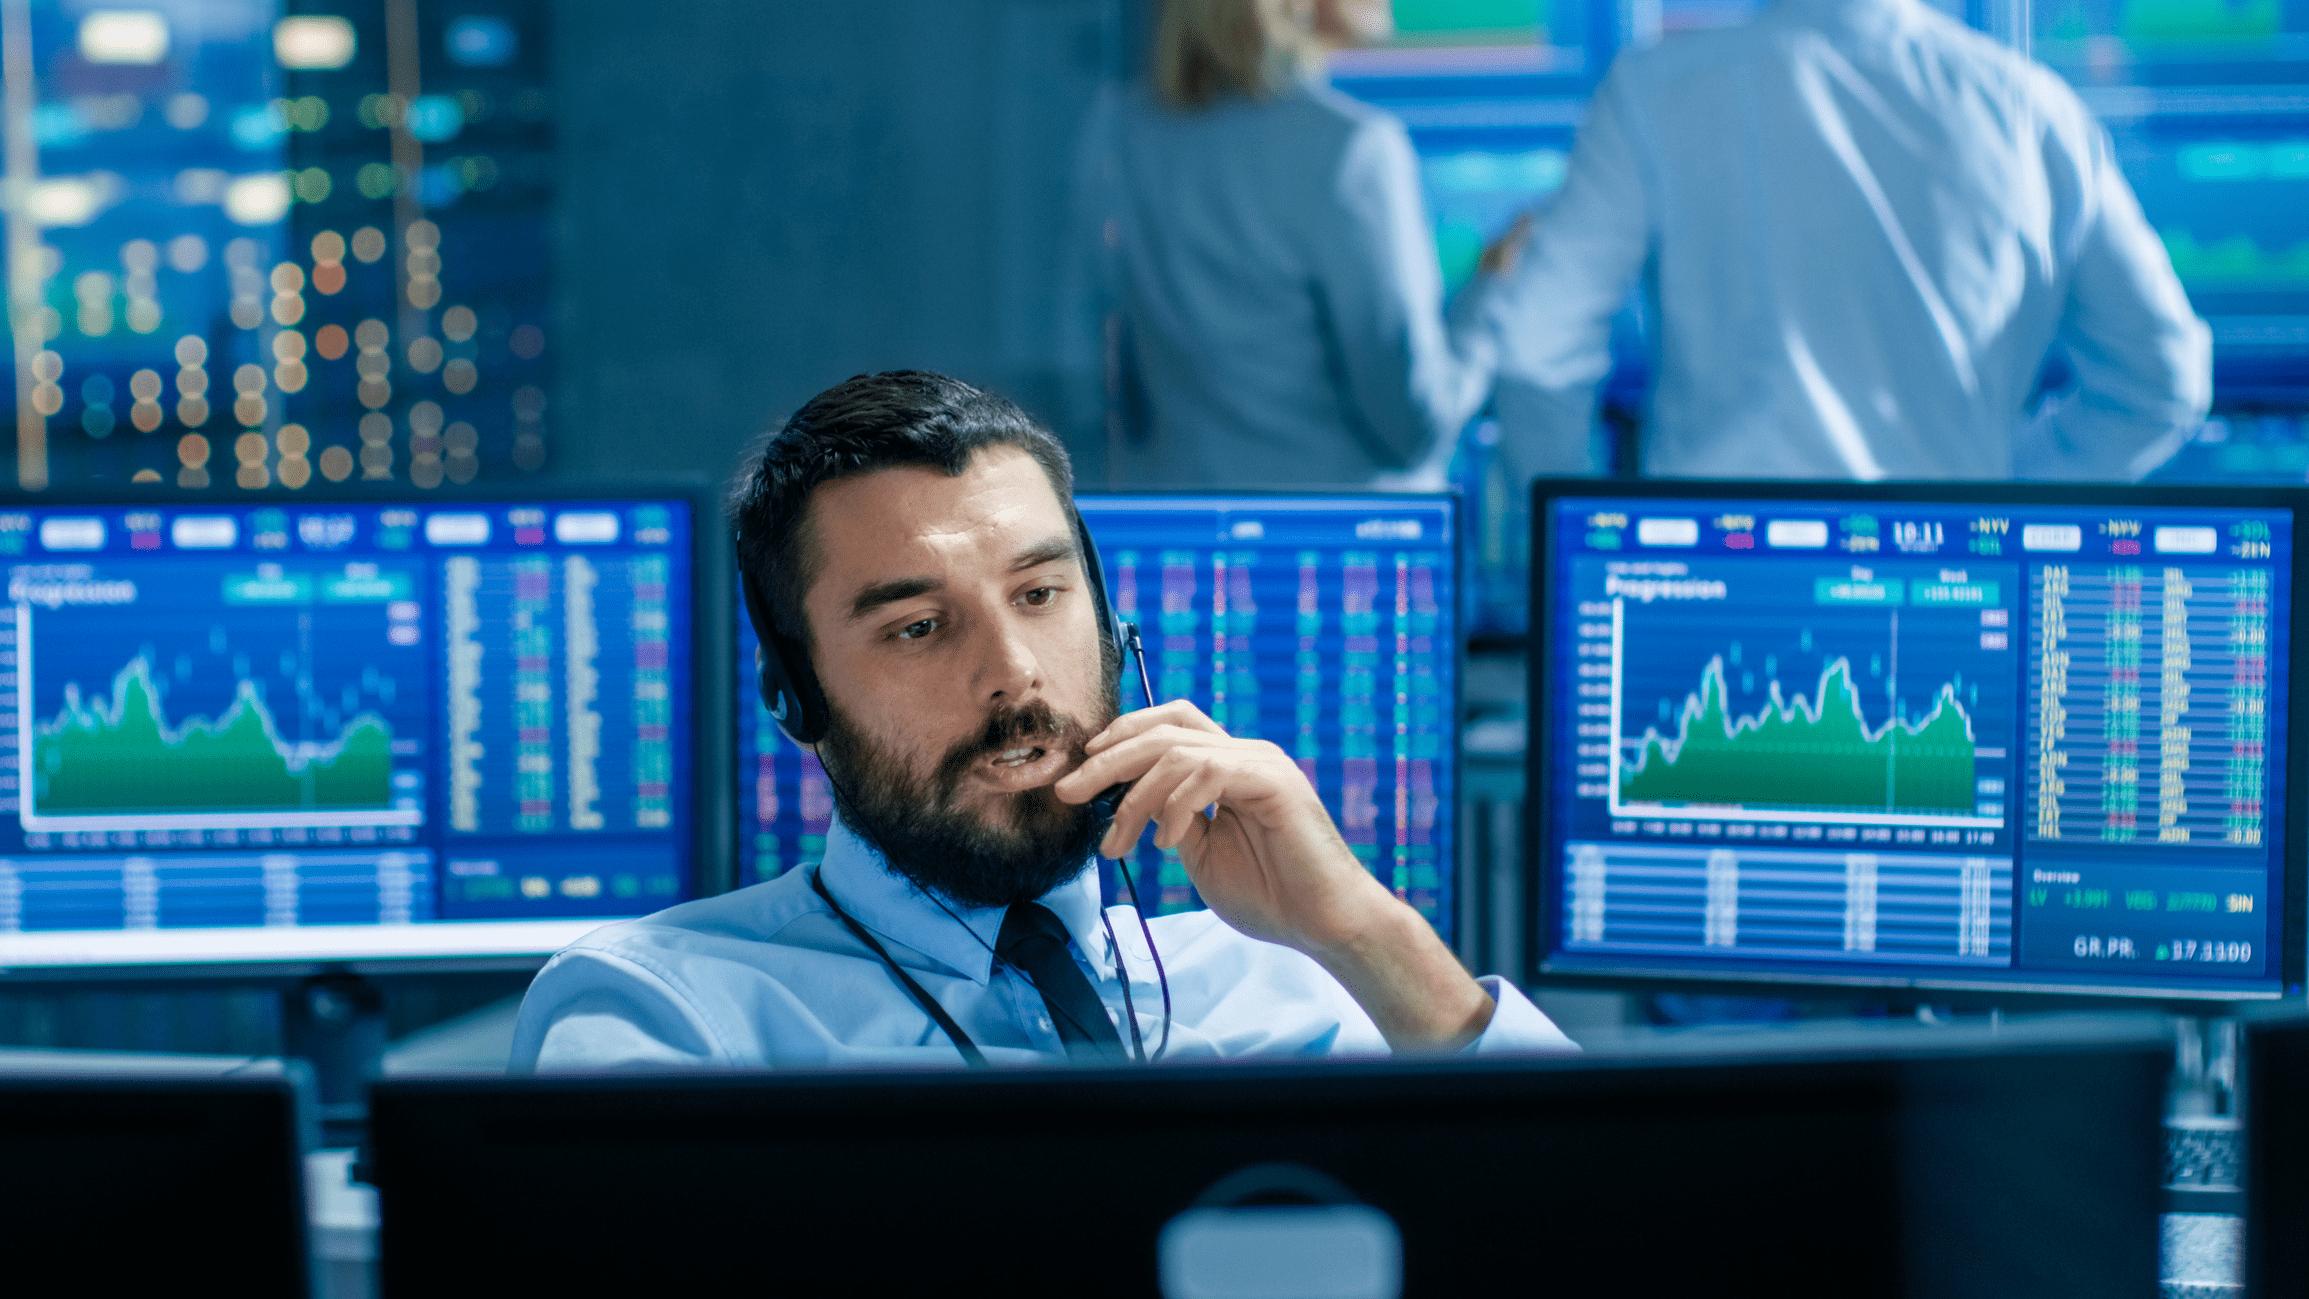 Mb trading futures inc